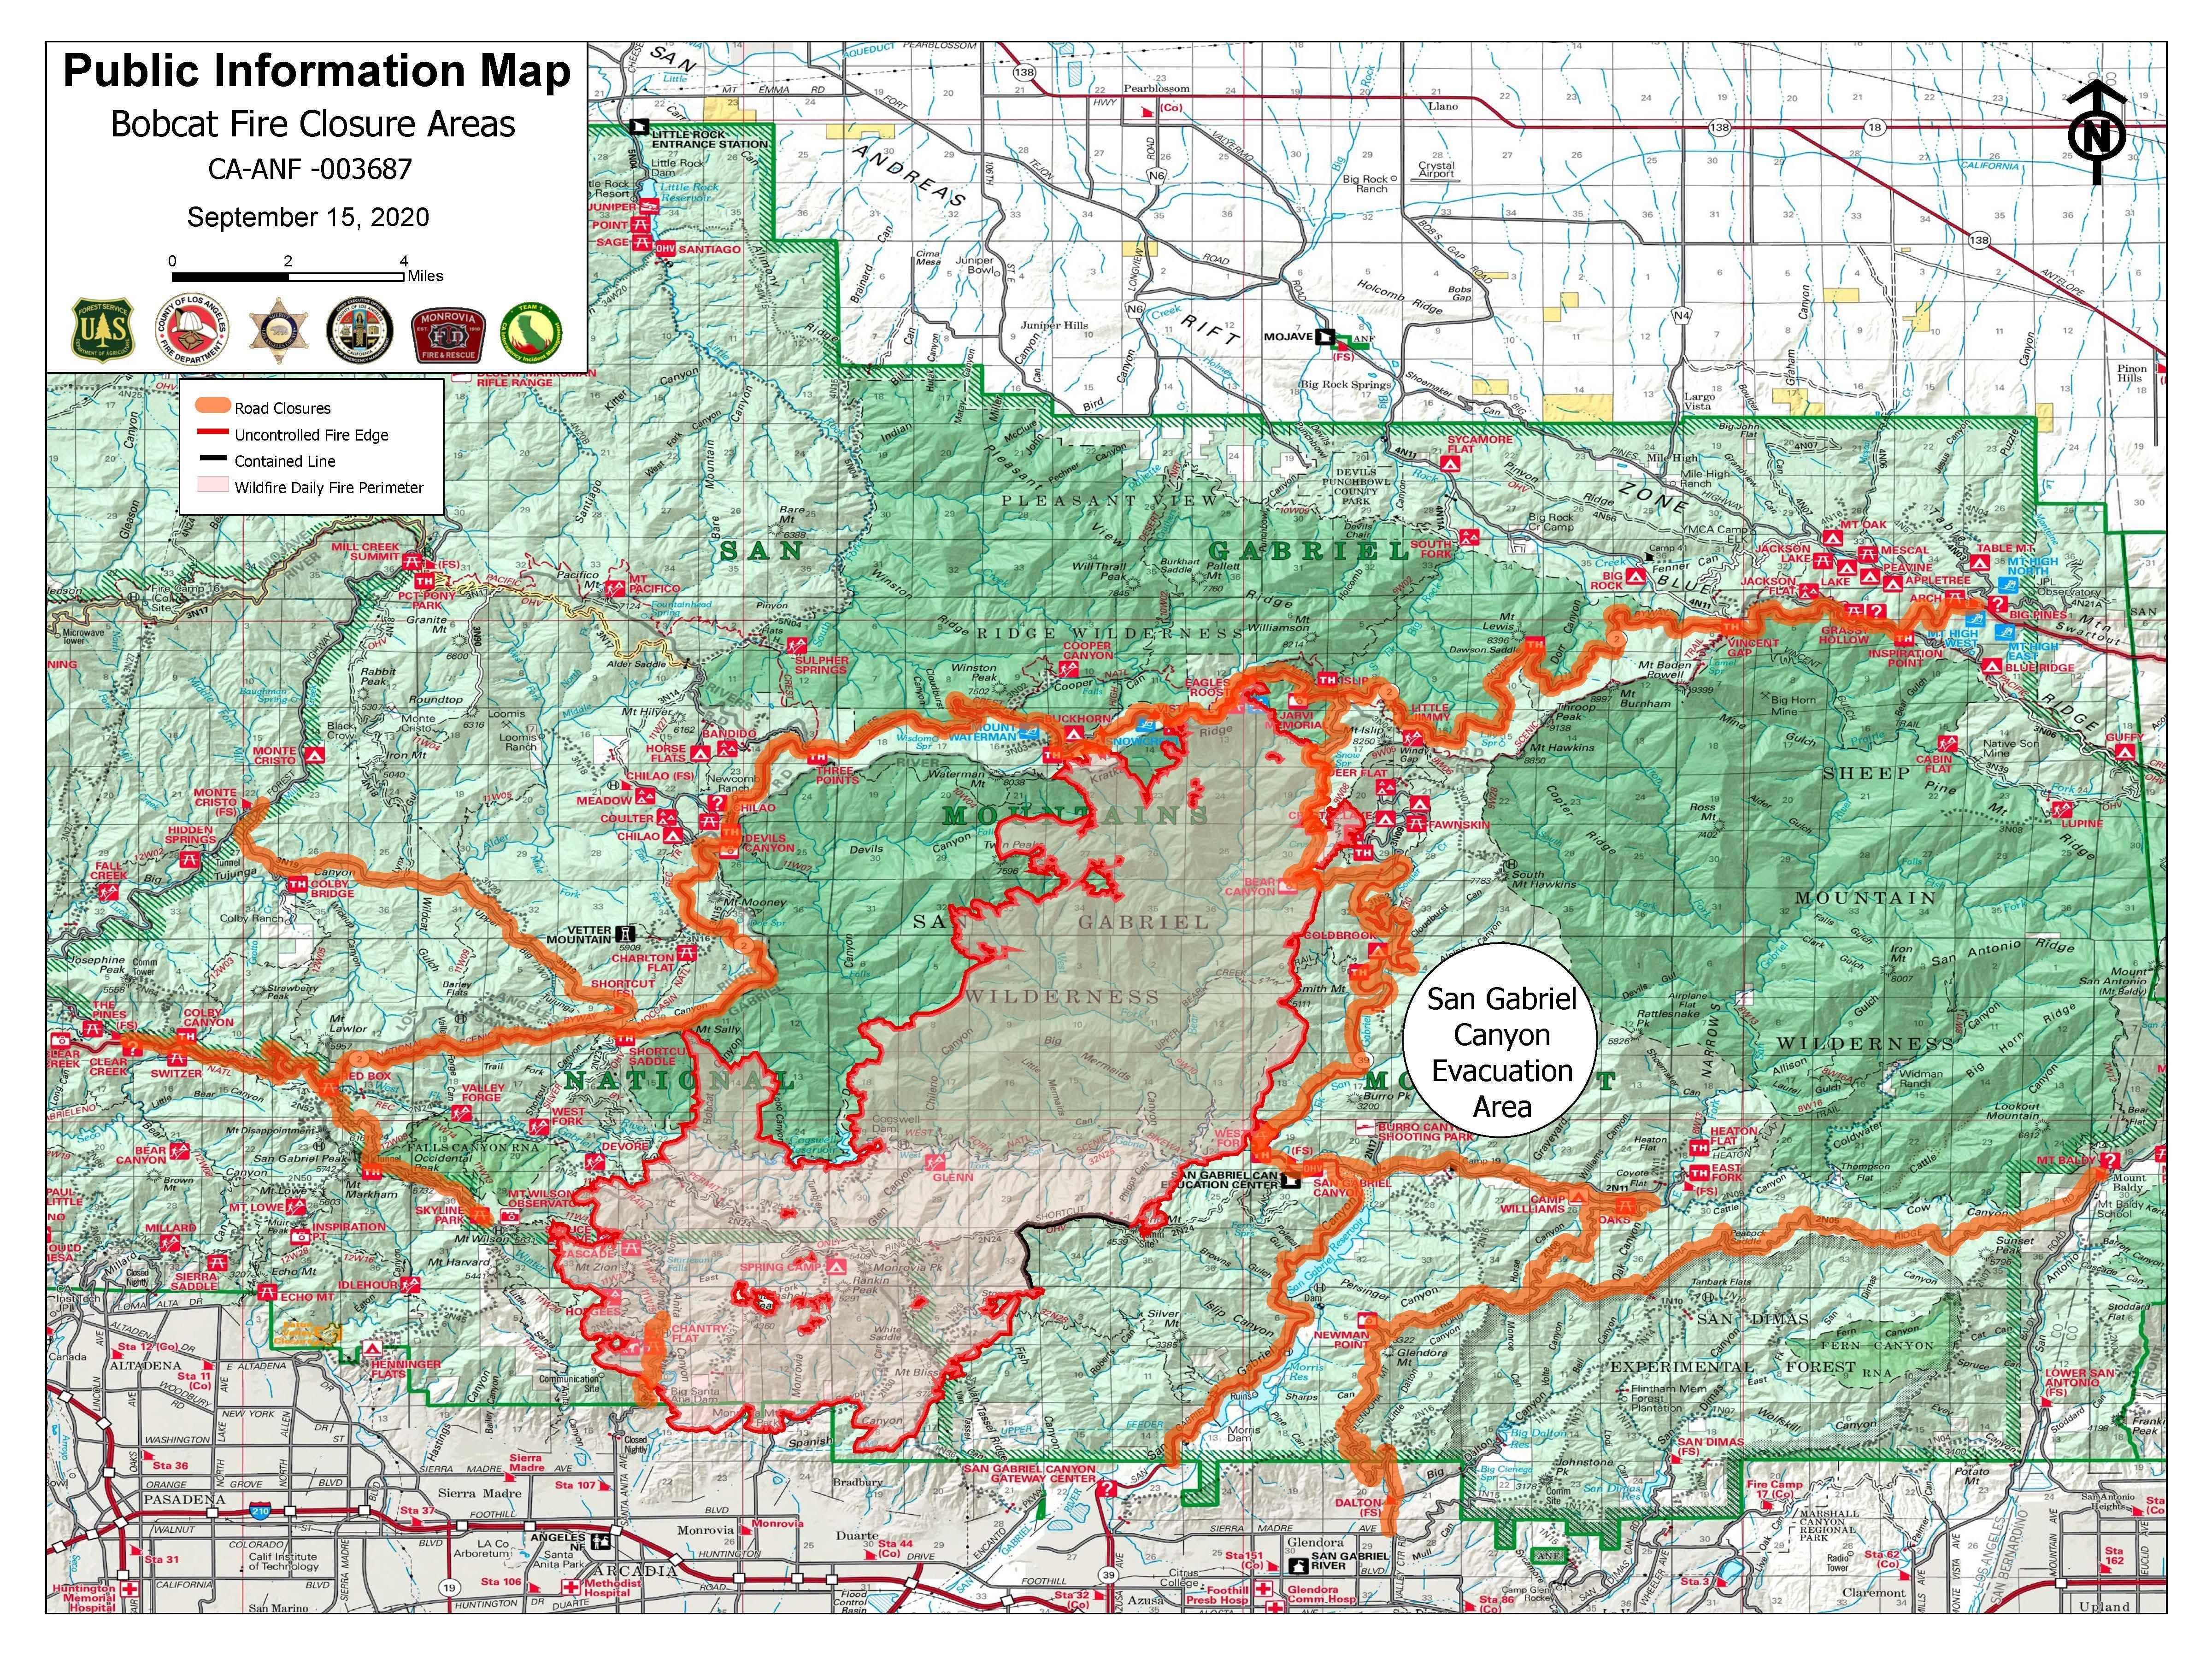 California Fire Map Update Bobcat Fire Update | September 15, 2020   Office of the City Manager